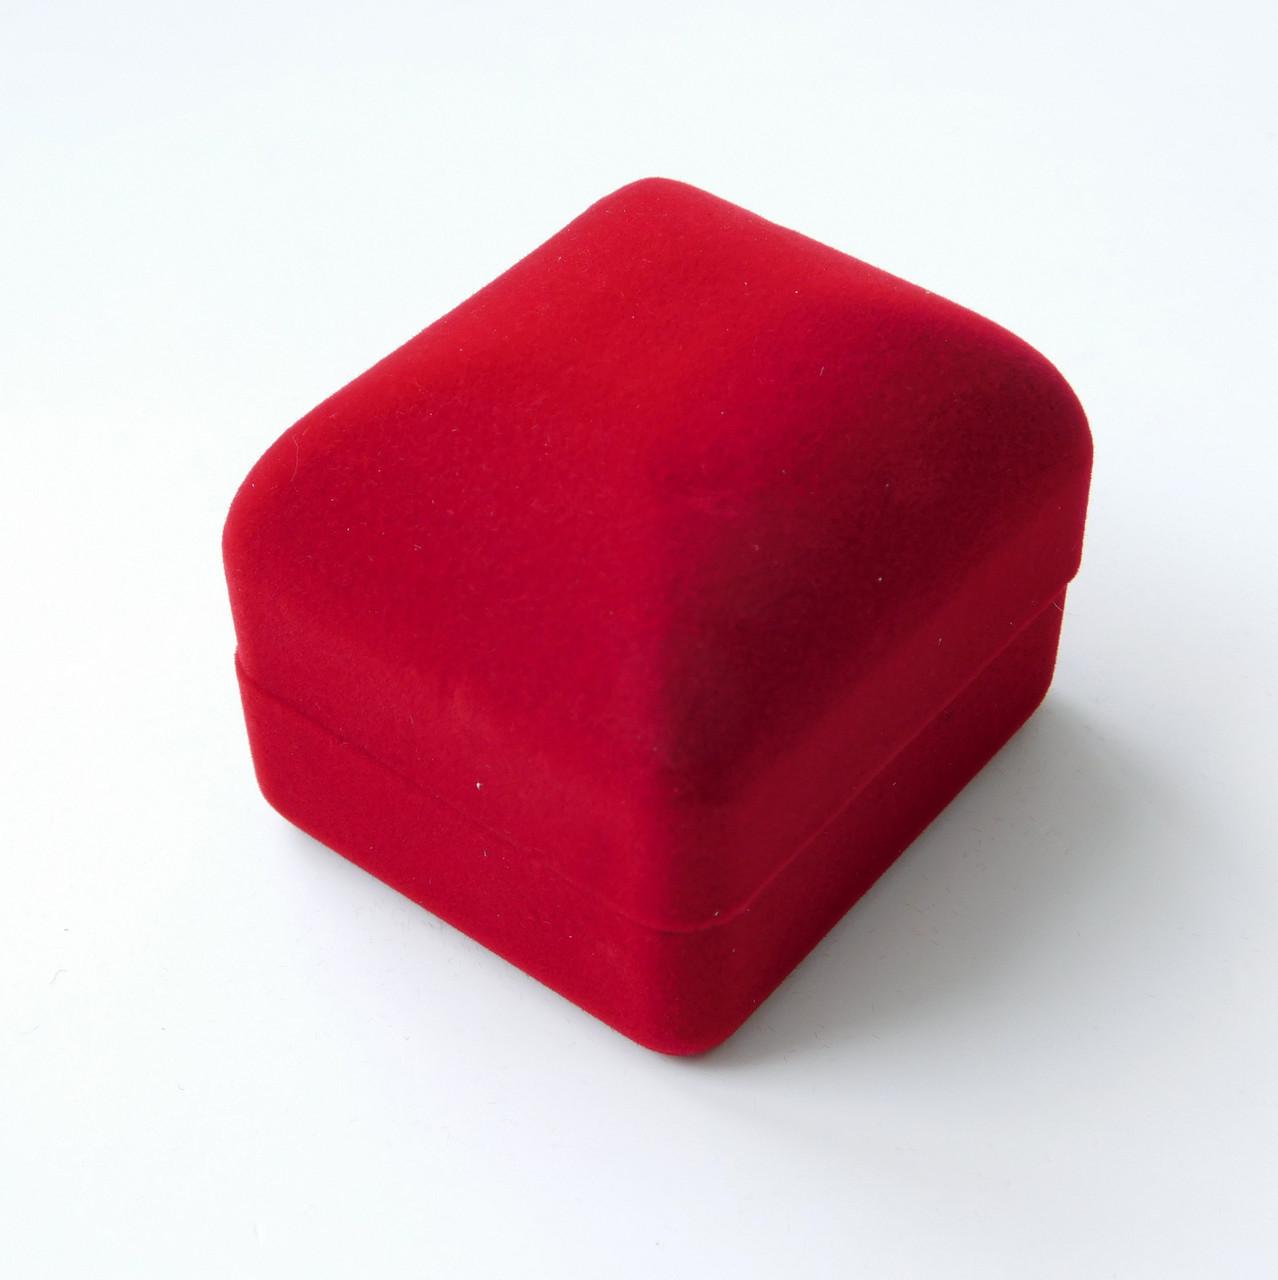 Футляр классика для кольца красный бархат 53474 размер 4.5х5.5 см